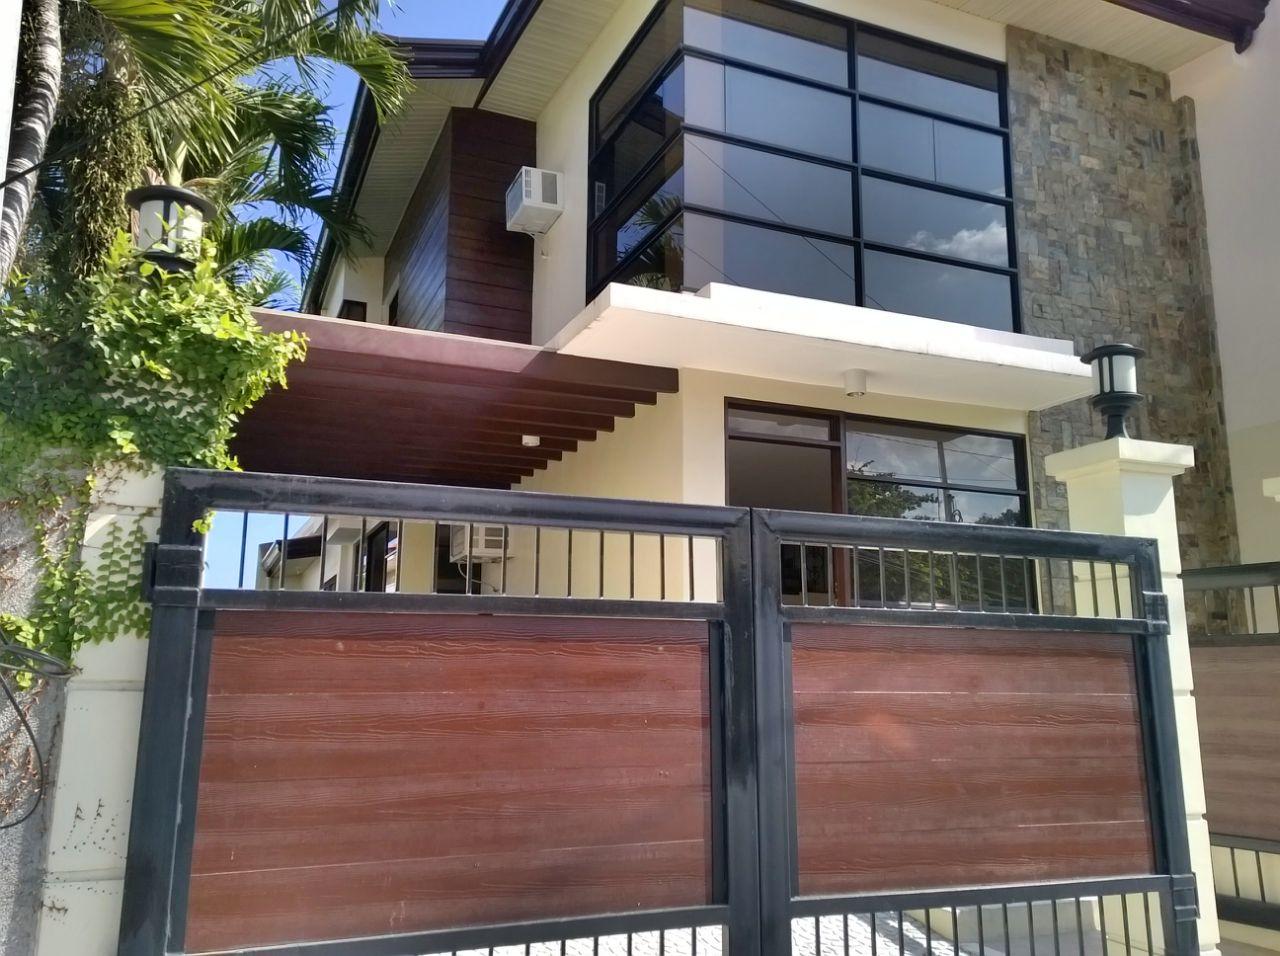 4 Bedroom House for Rent in Banilad Cebu City